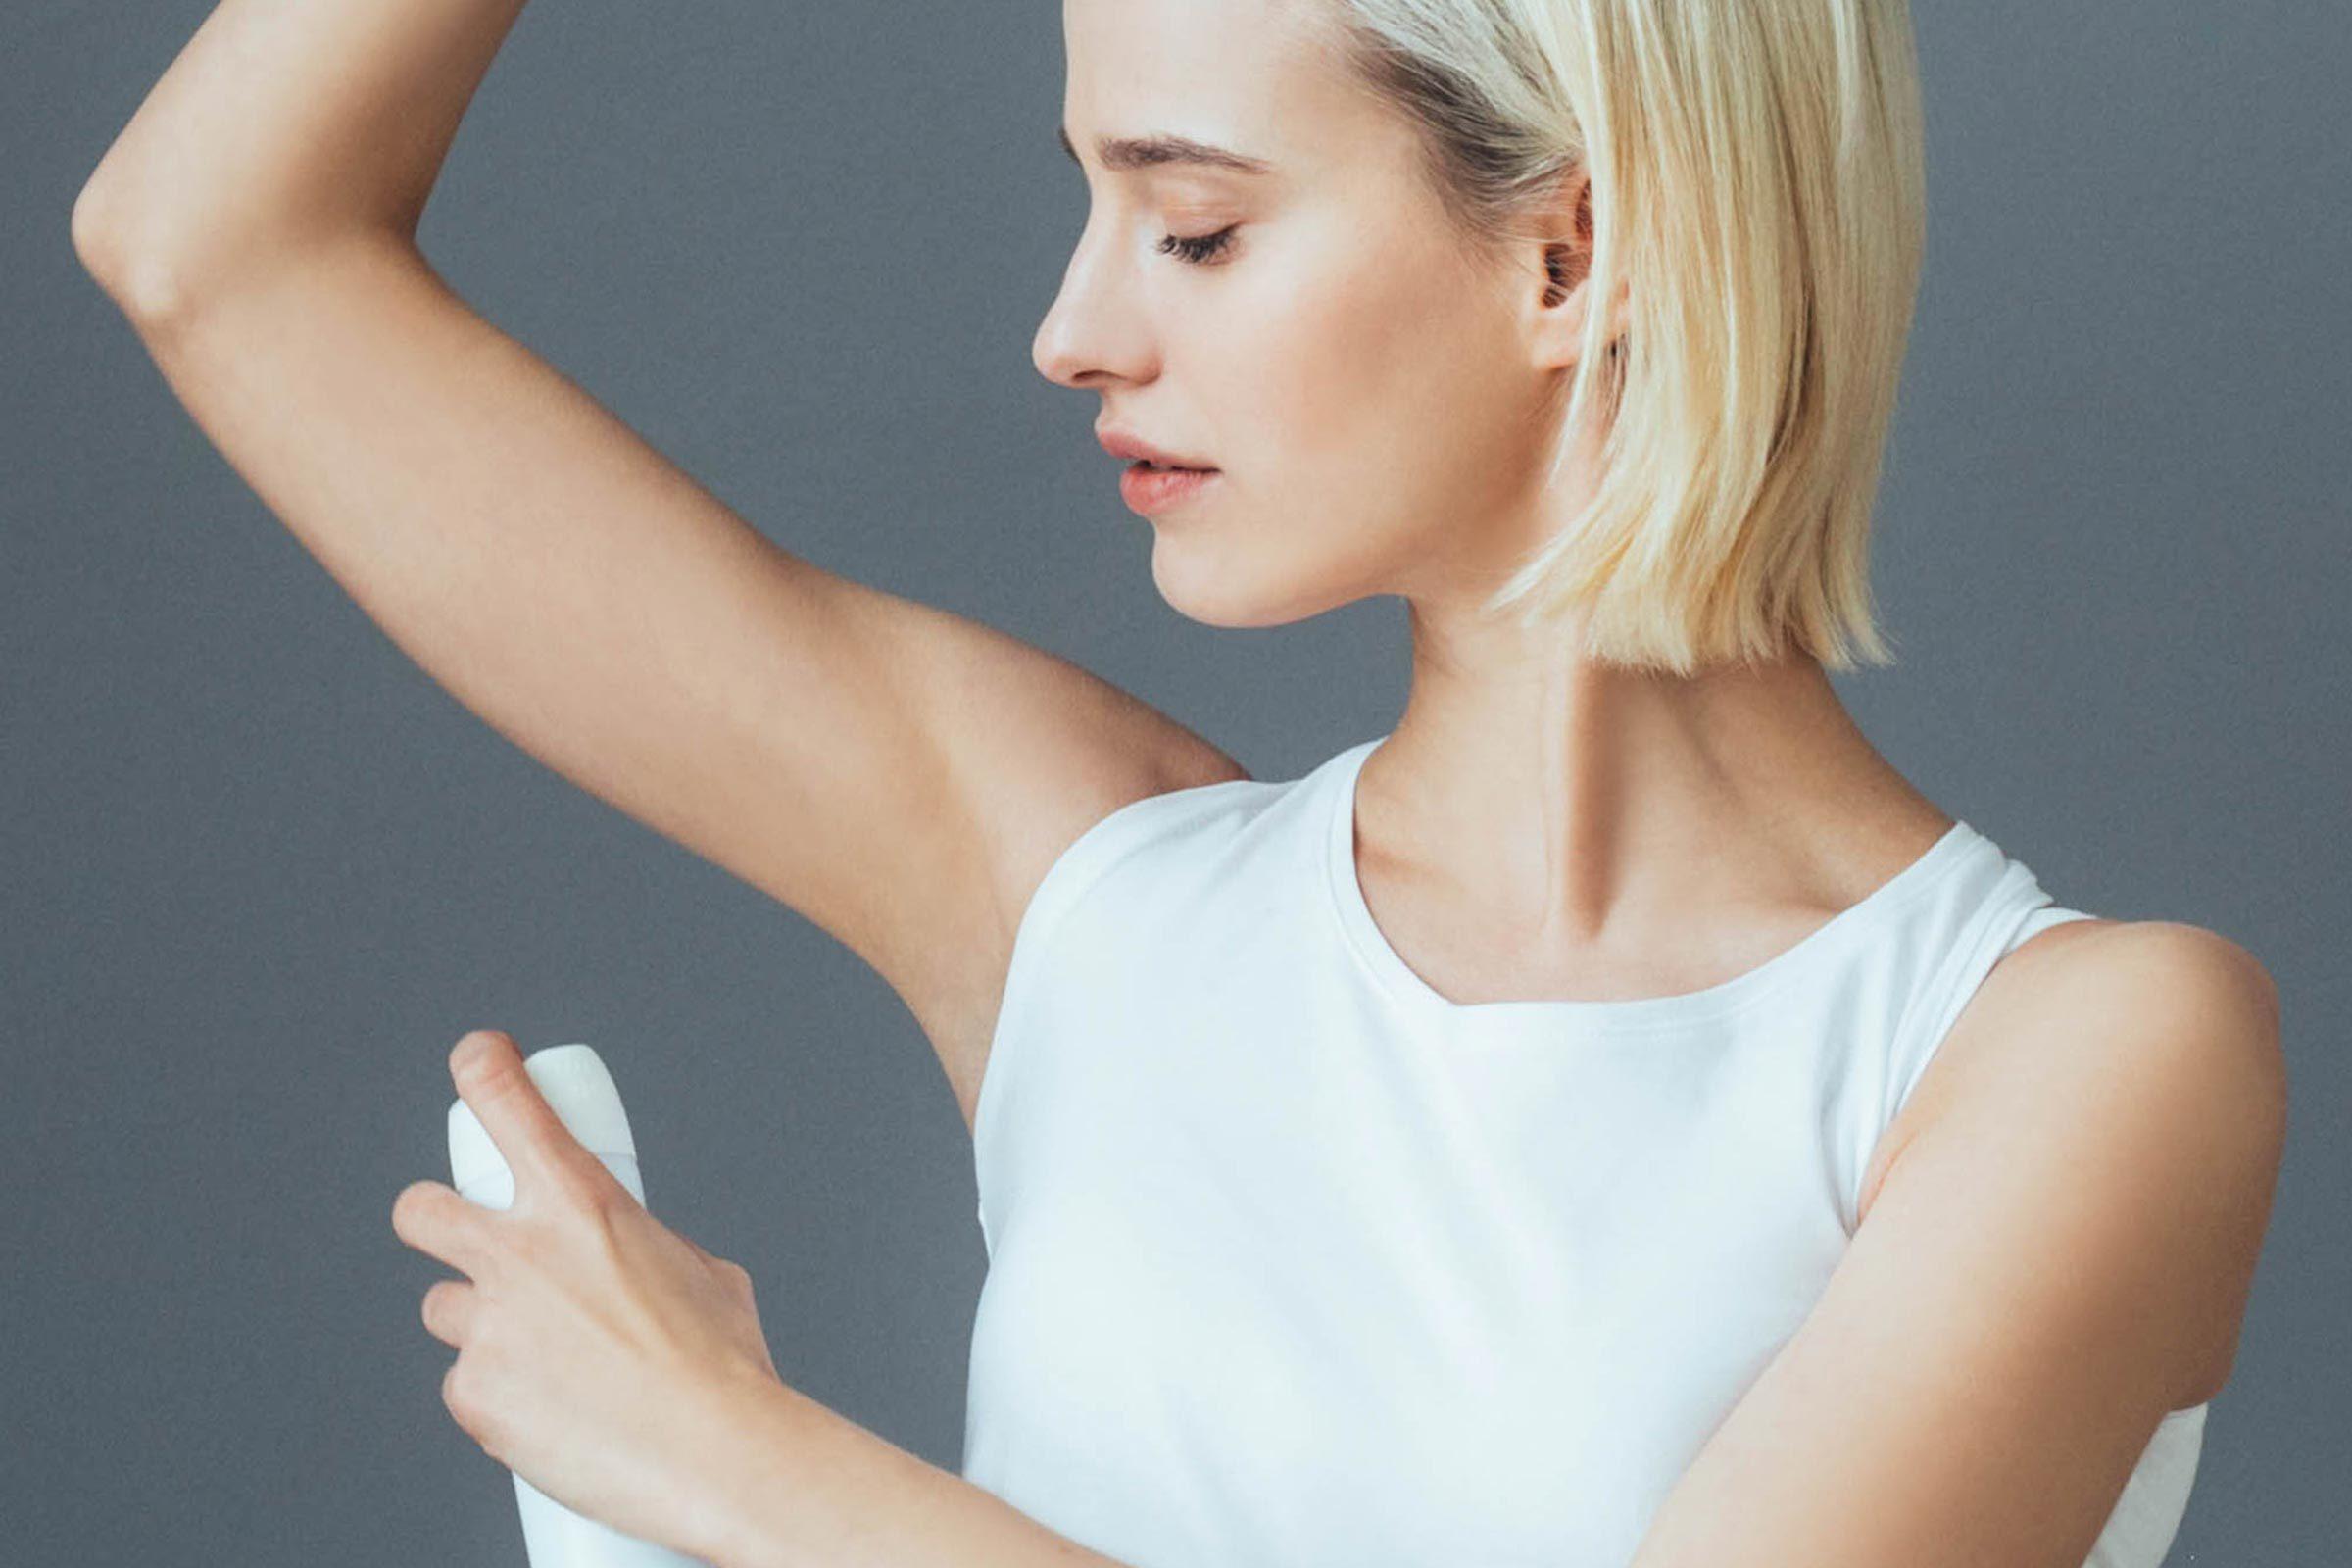 woman applying deodorant spray to armpit